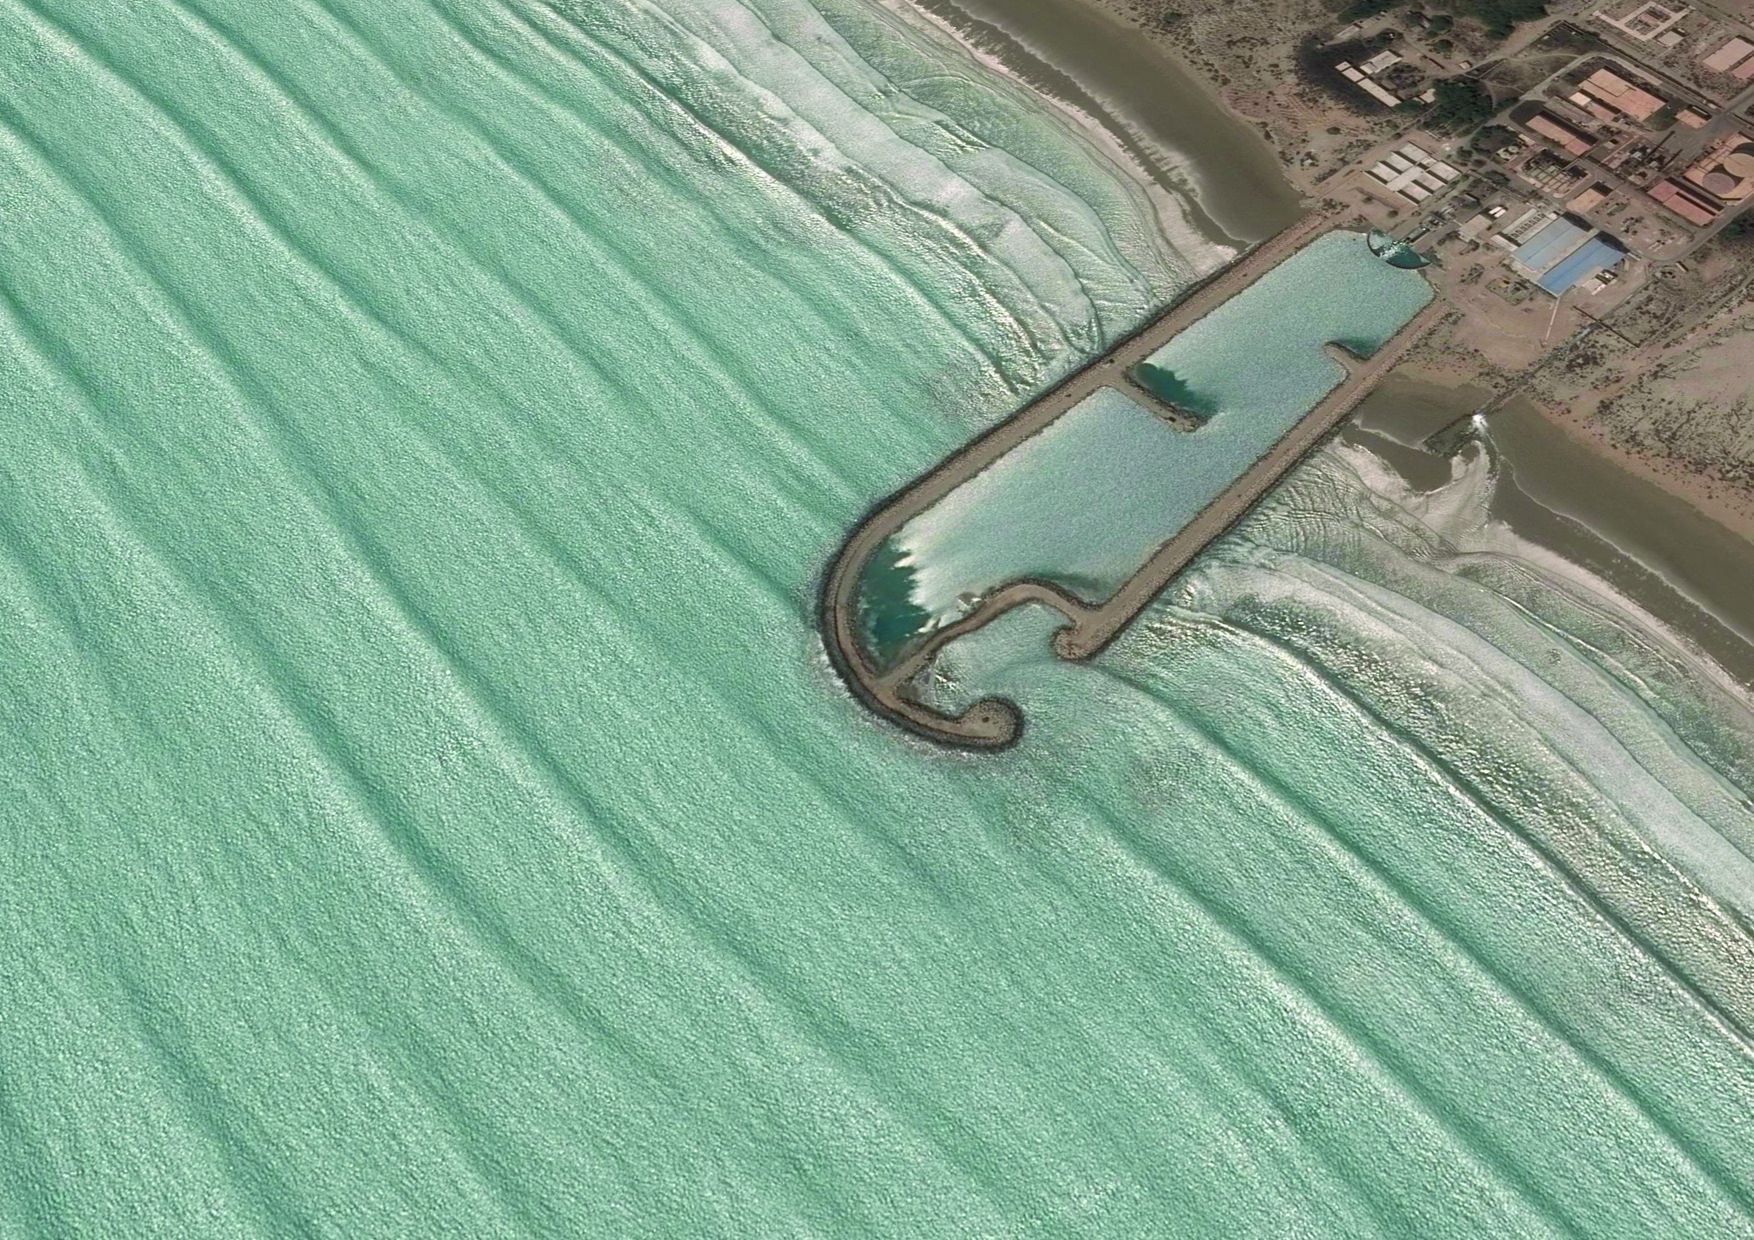 Konarak Water Treatment Plant